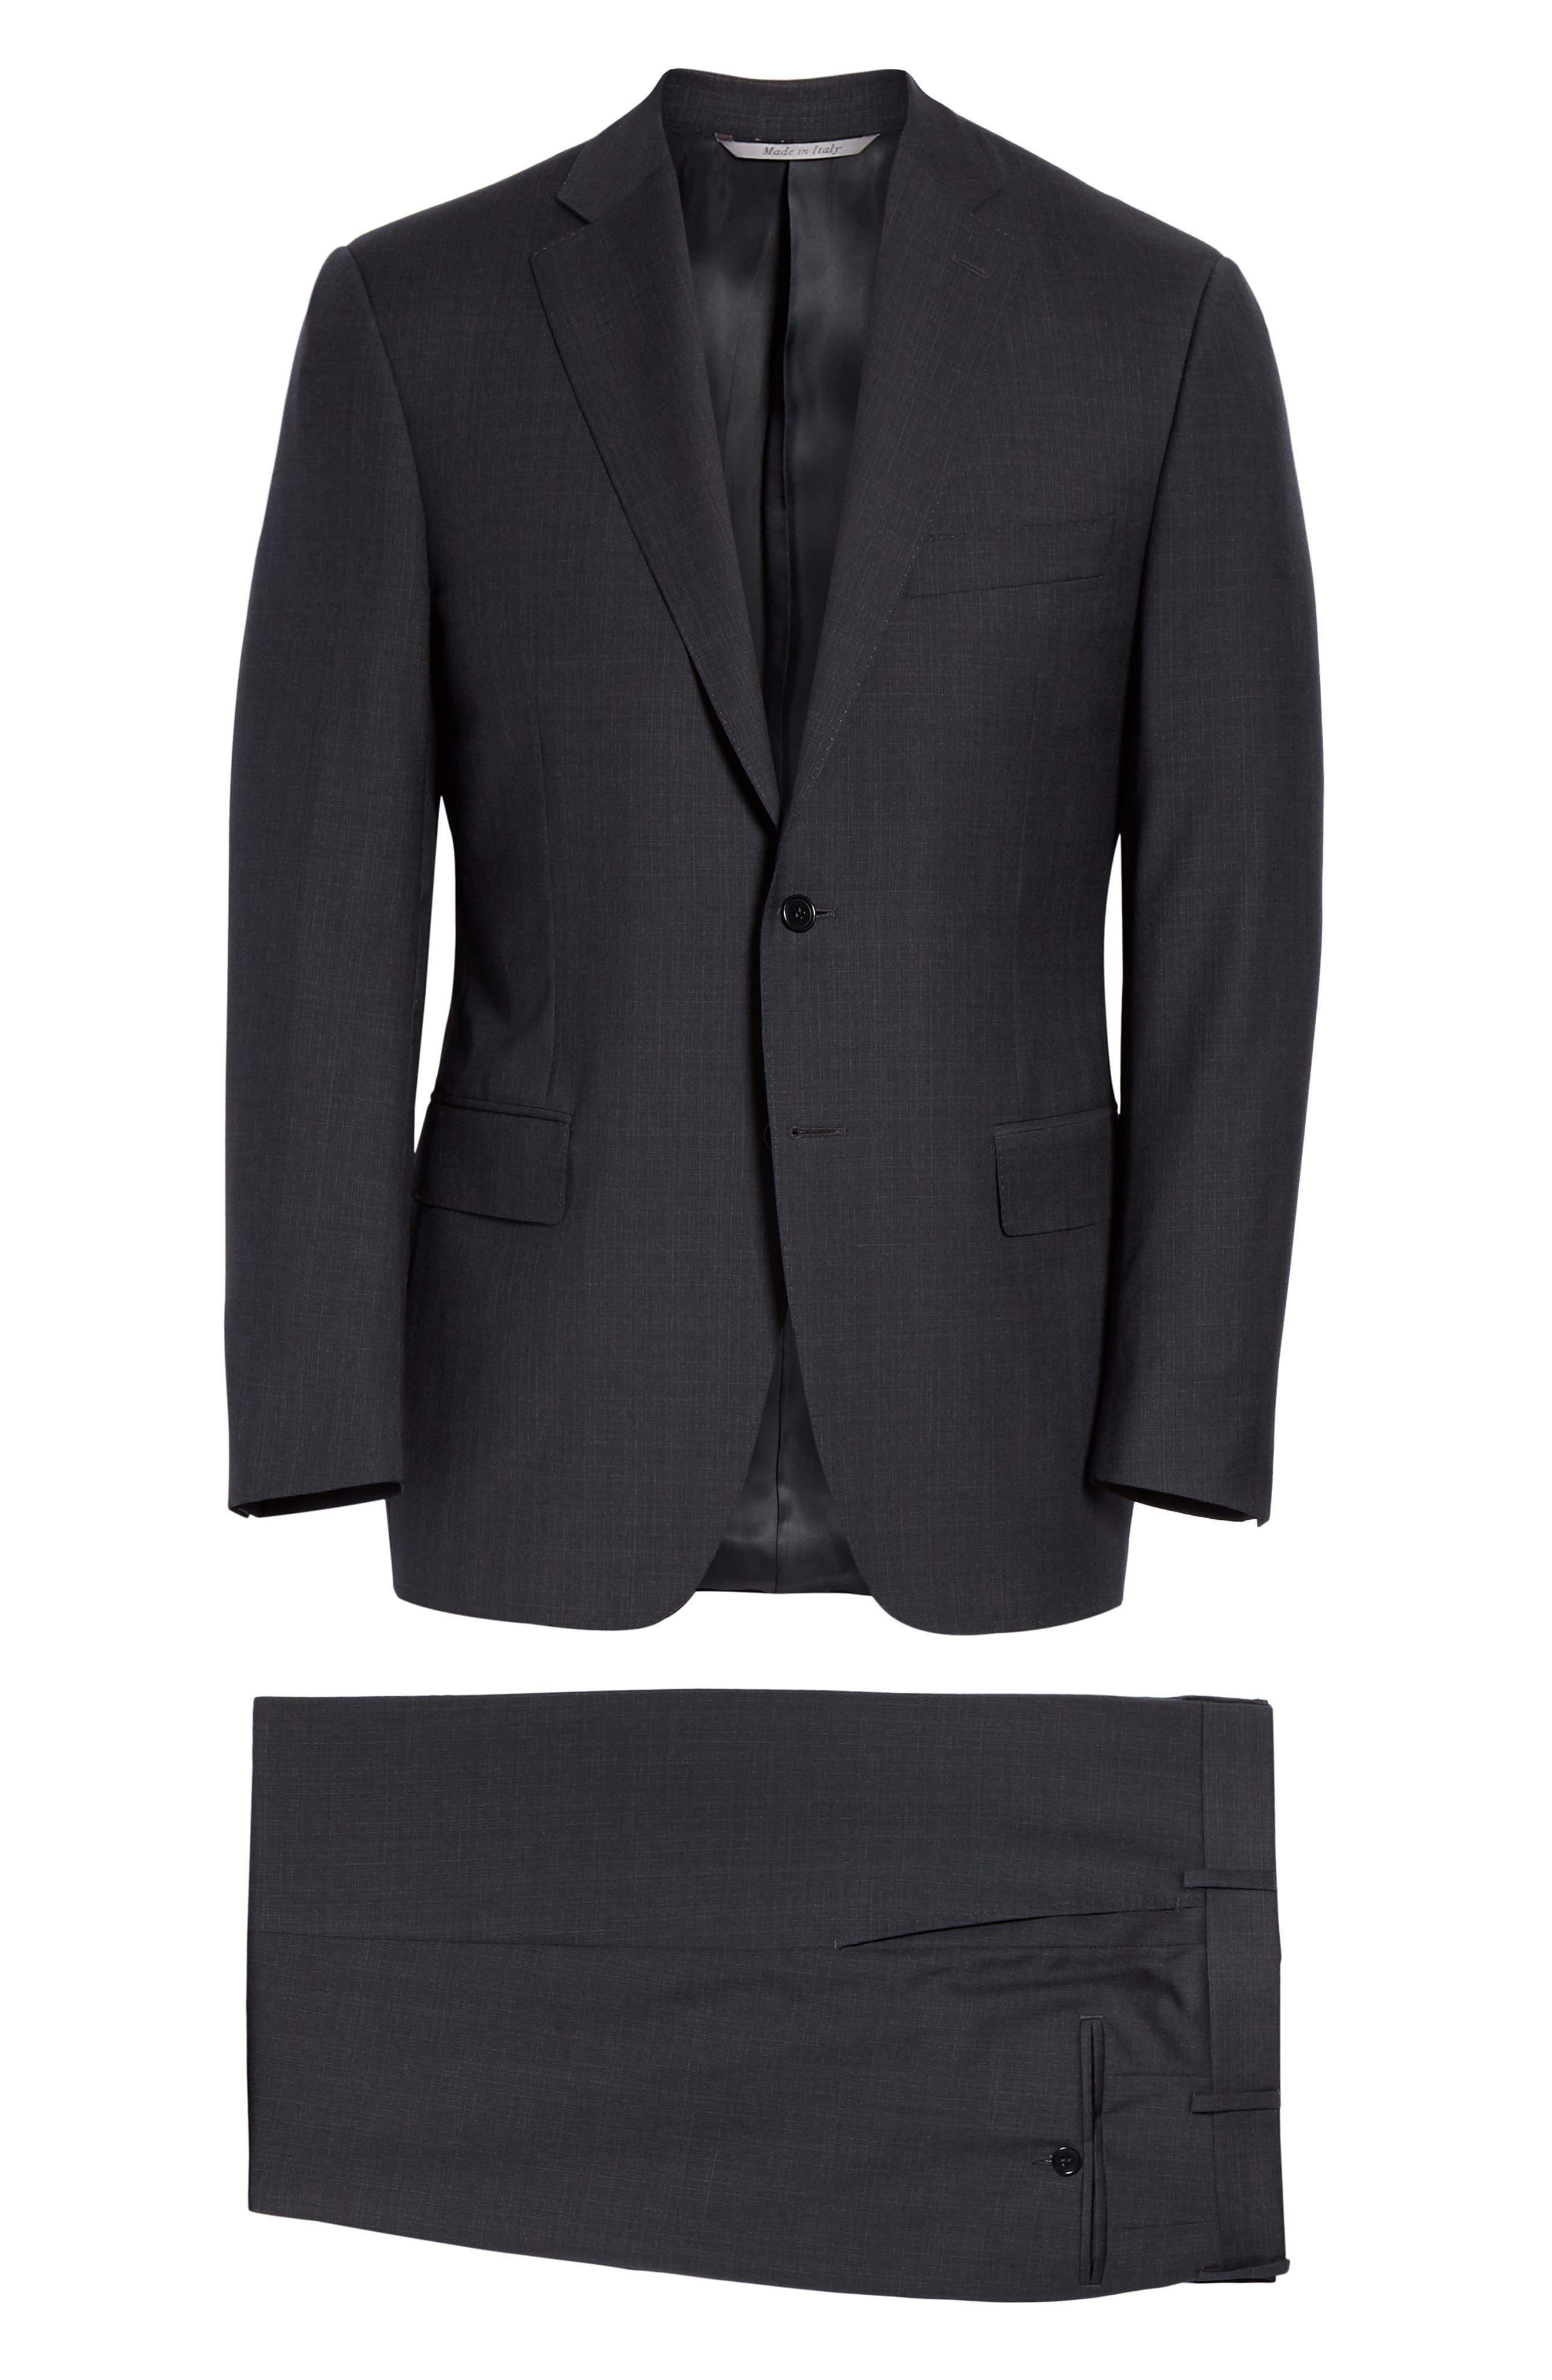 Siena Classic Fit Solid Super 130s Wool Suit,                             Alternate thumbnail 8, color,                             BLACK